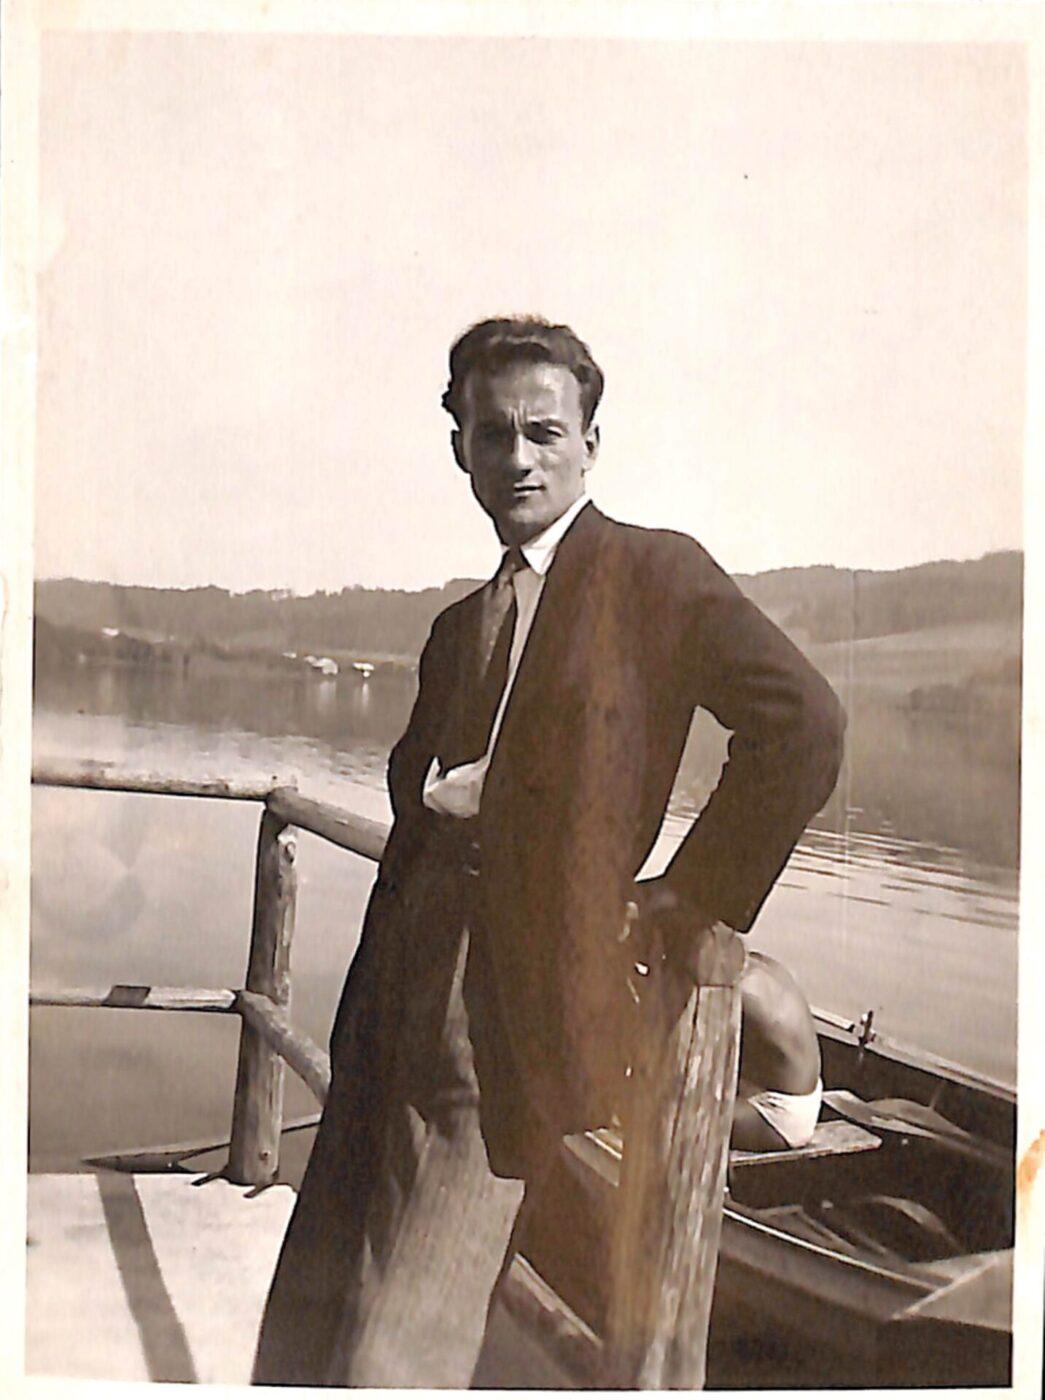 Nikos Skalkotas Seeham (Αυστρία, 1934)_1_1